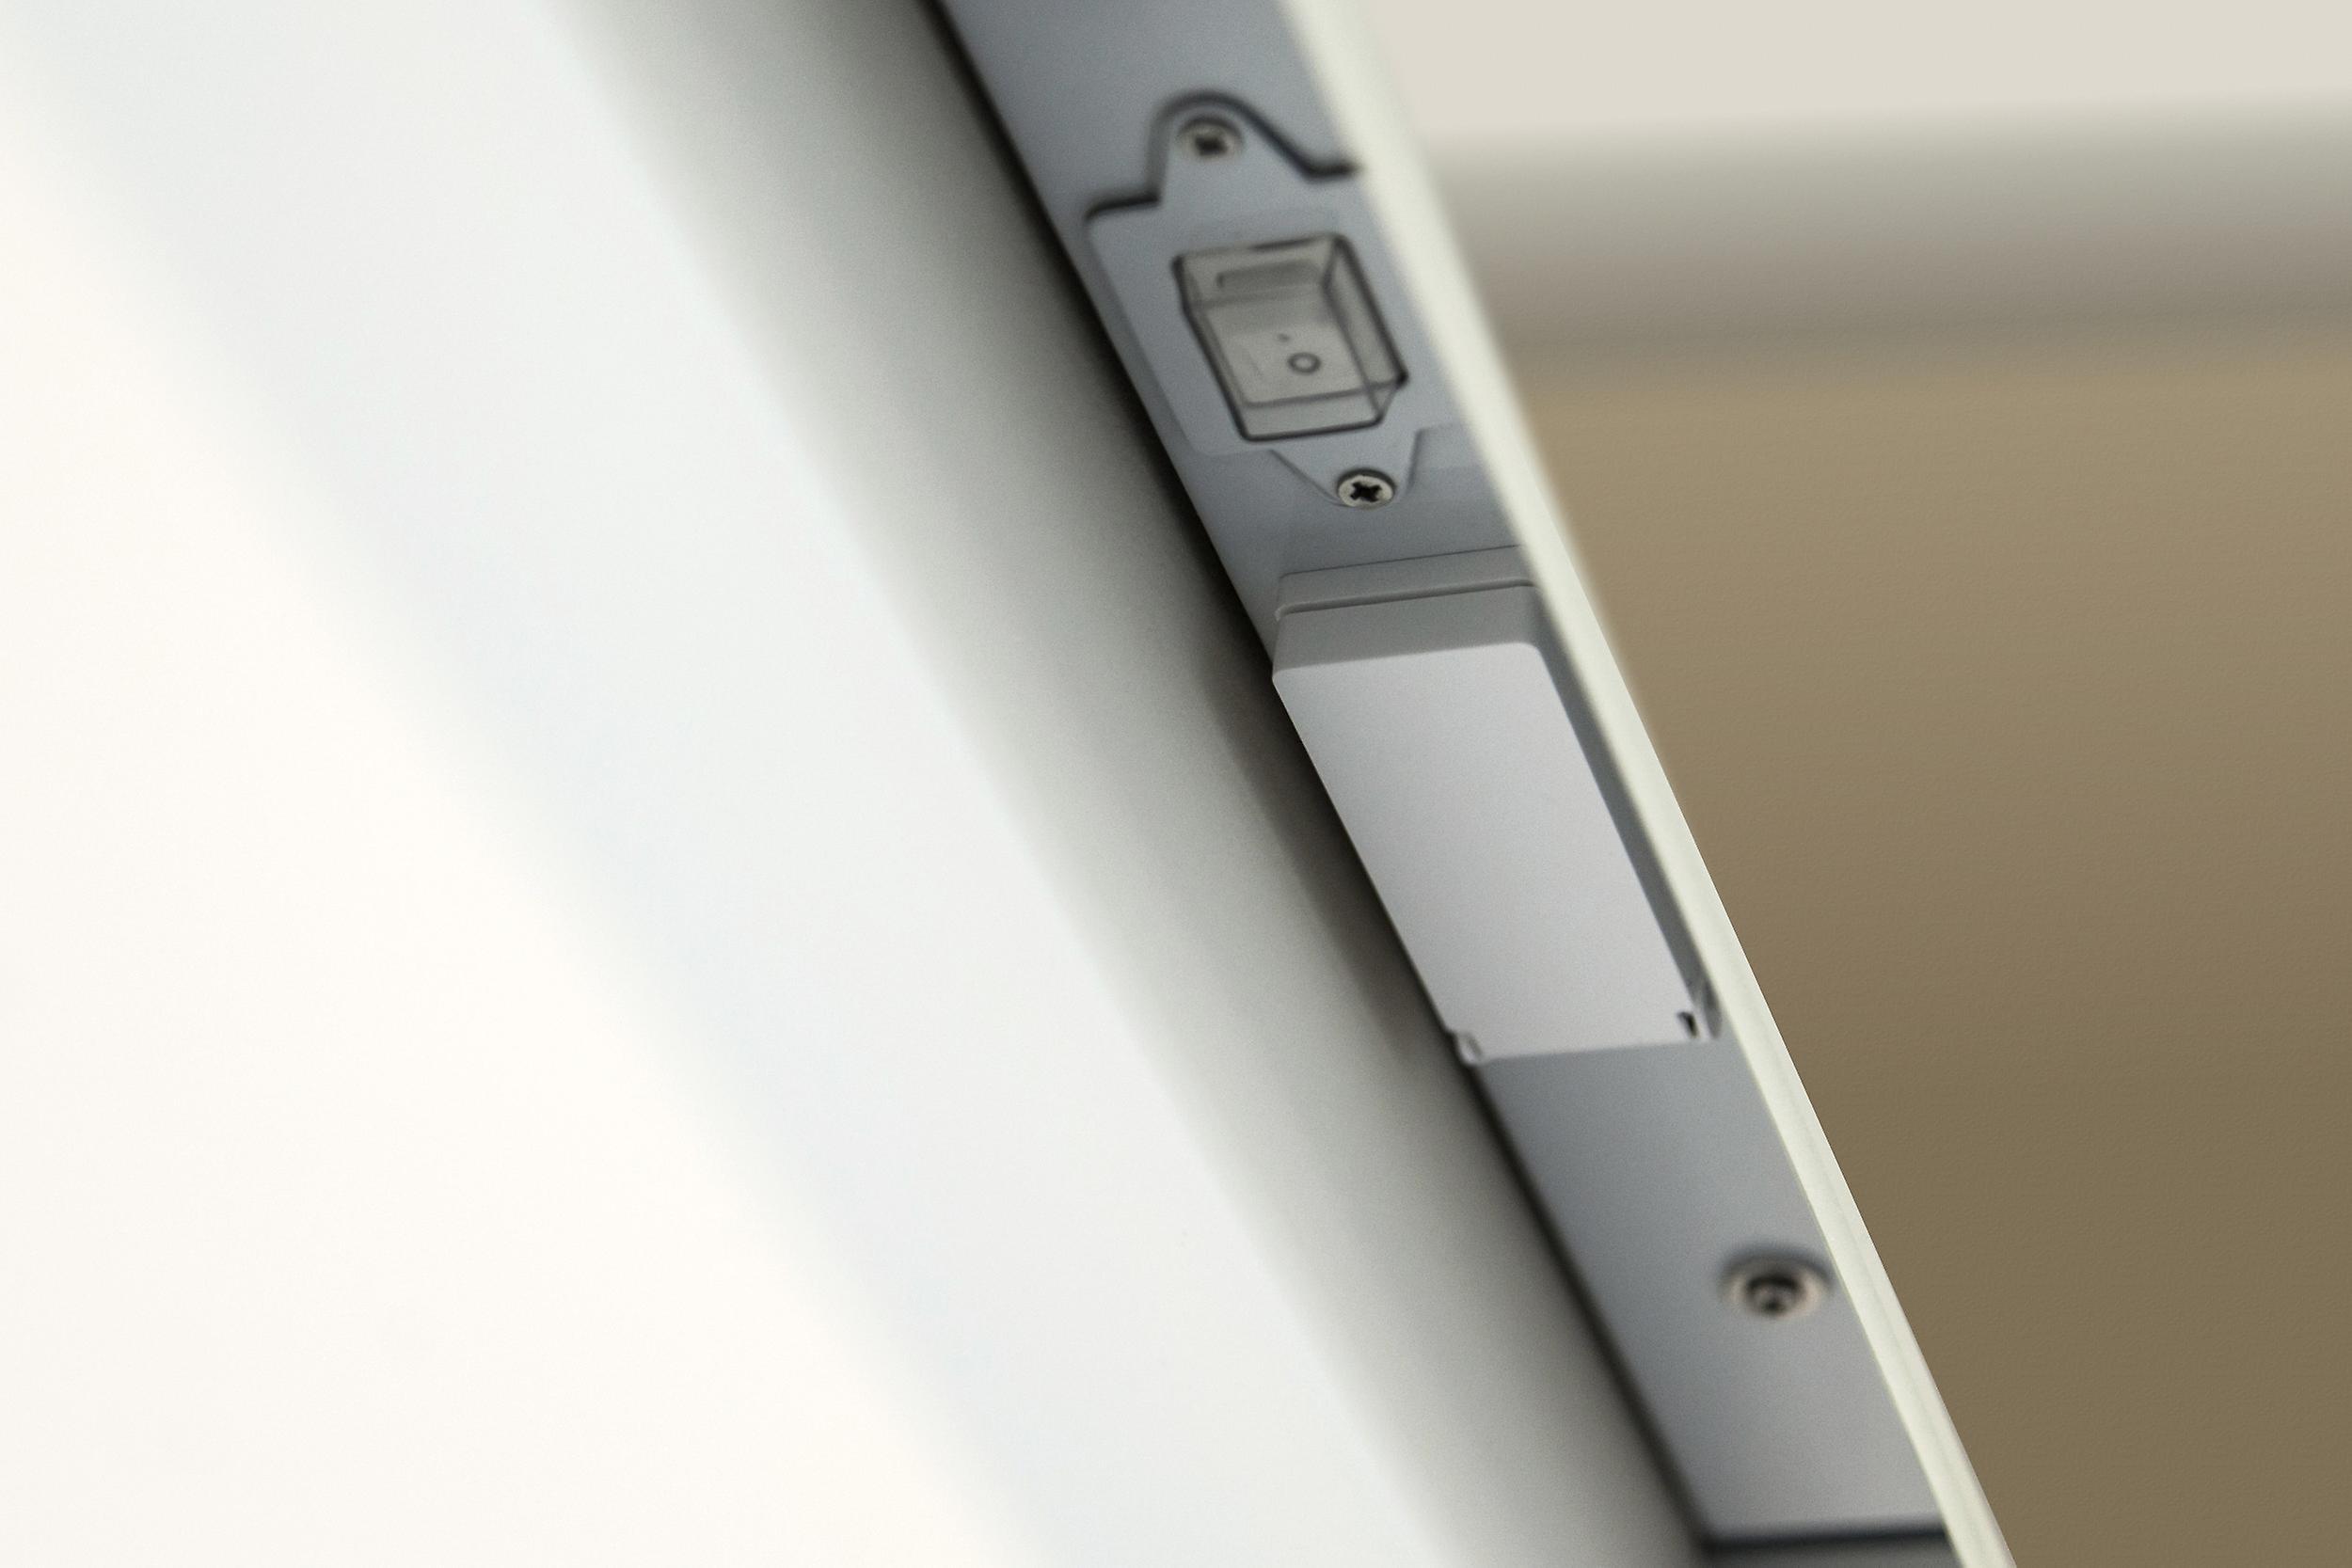 Tauri Audio Shaver Mirror with Sensor, Shaver & Demister Pad k5301aud